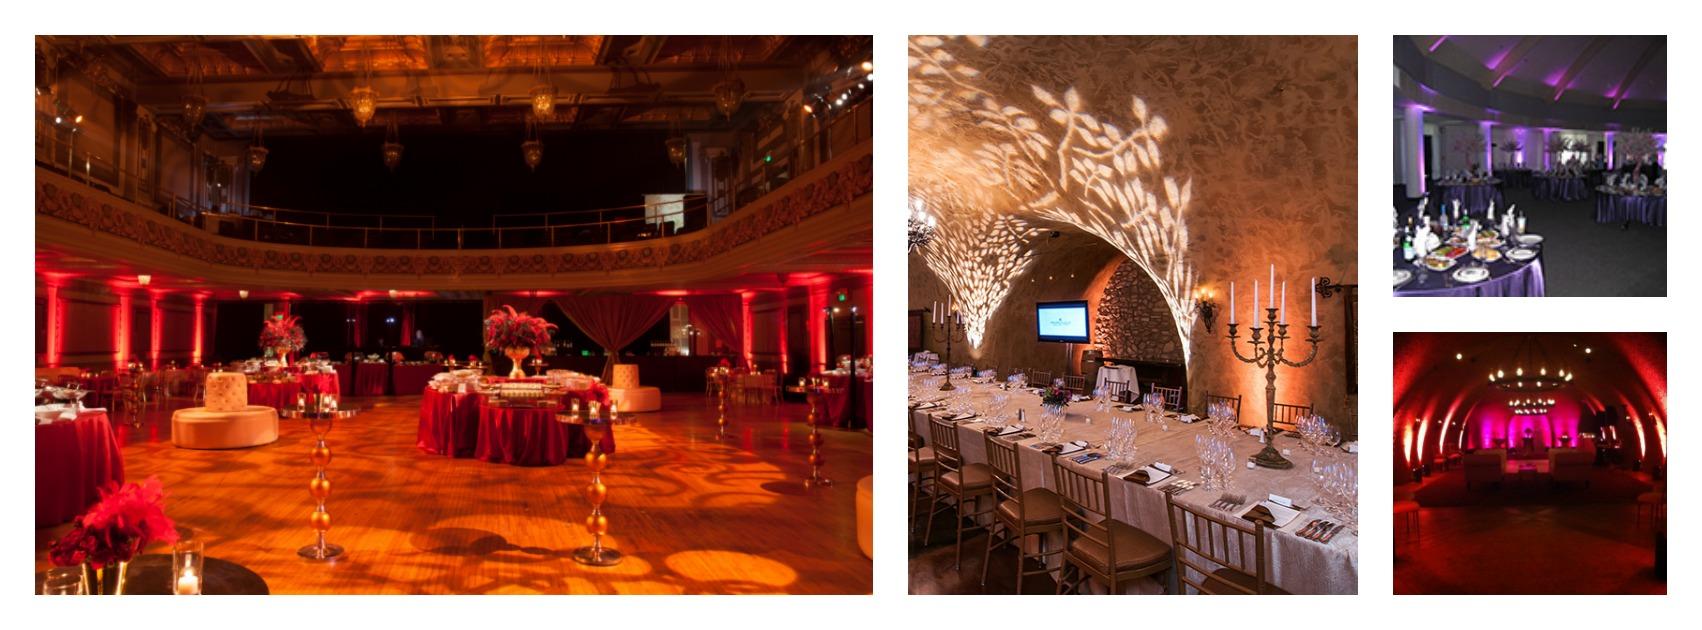 Decor lighting transforms a plain hall into a palace